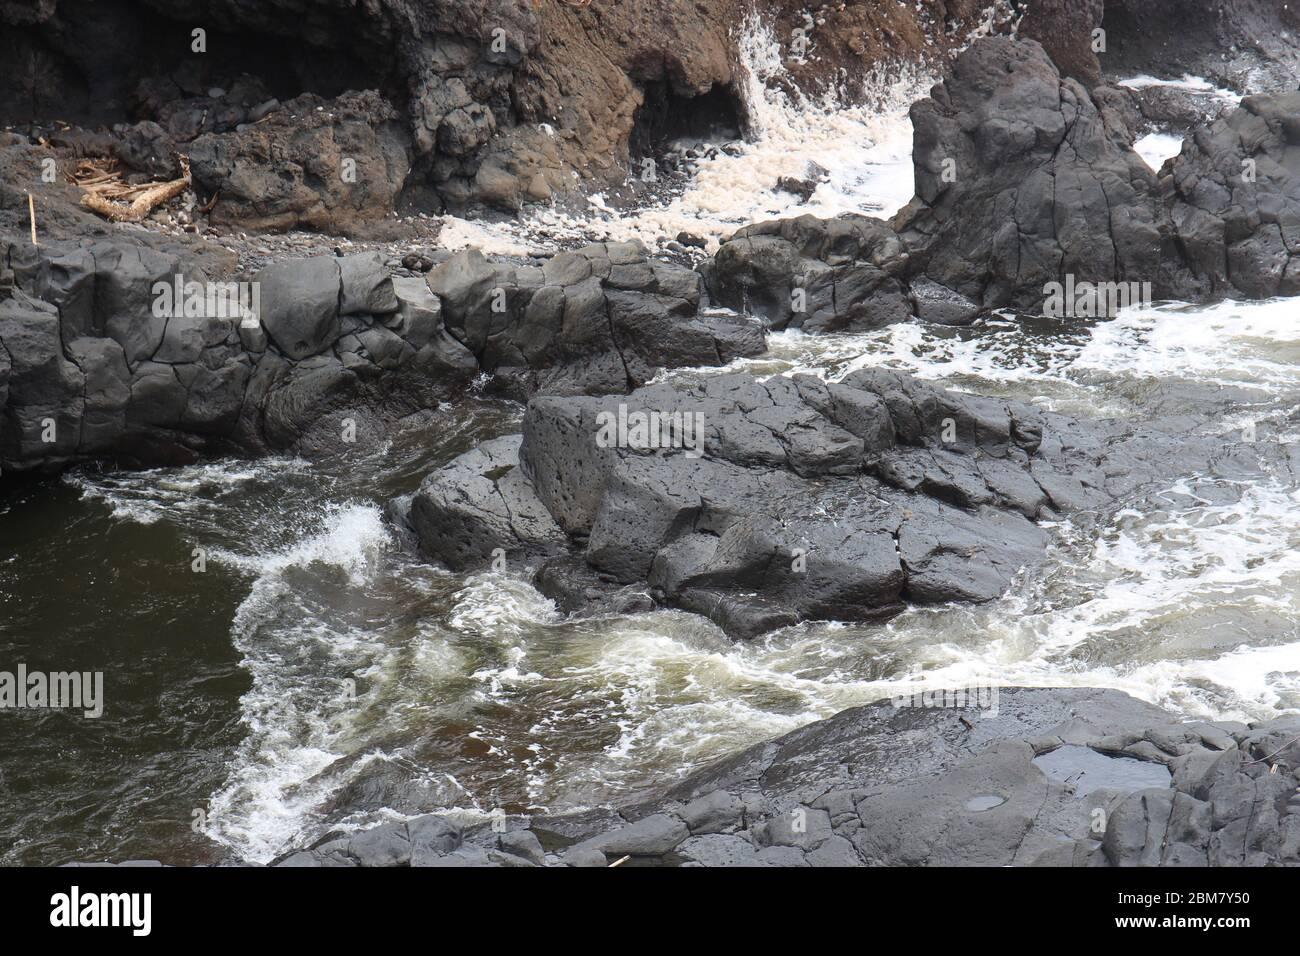 Il torrente Palikea attraversa la roccia vulcanica presso l'Oheo Gulch a Hana, Maui, Hawaii, USA Foto Stock